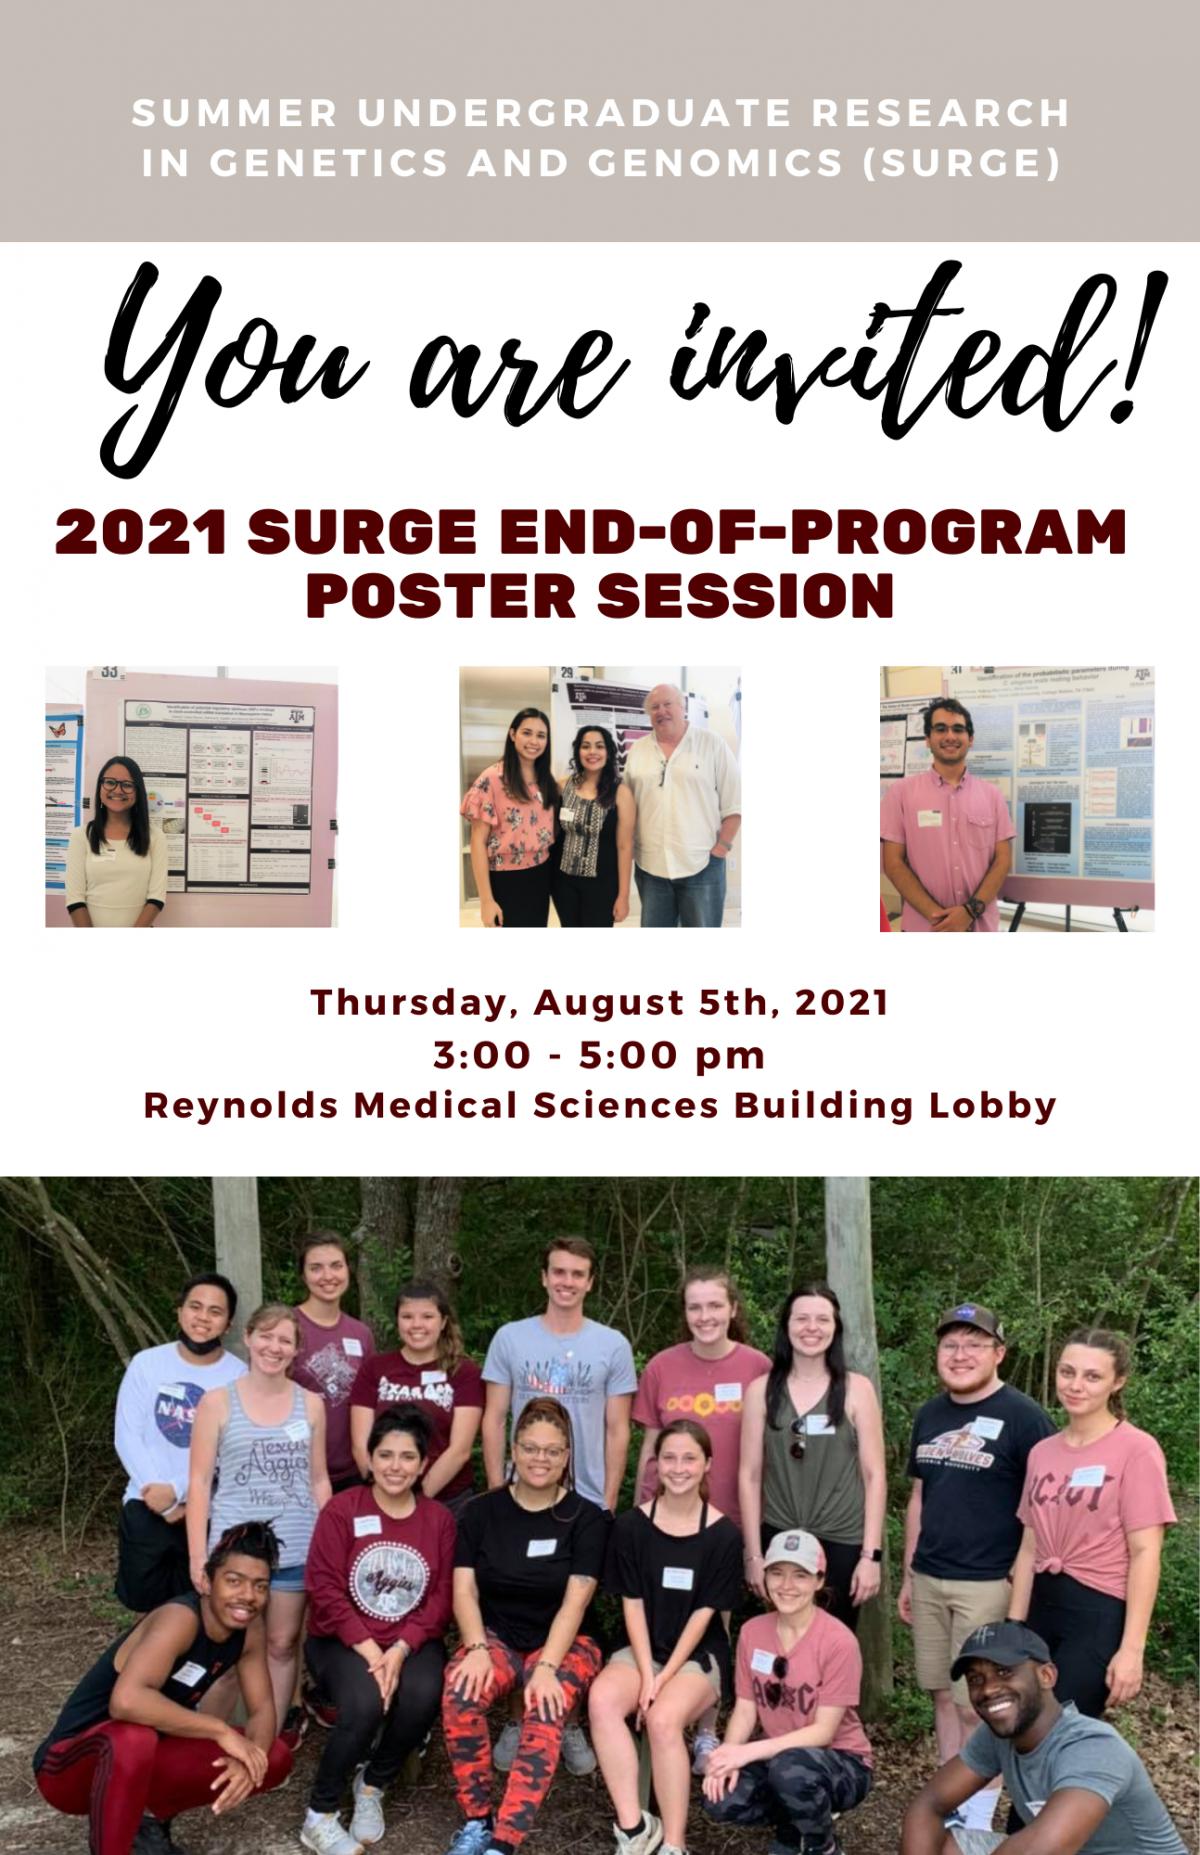 2021 Summer Undergraduate Research in Genetics and Genomics (SURGe)